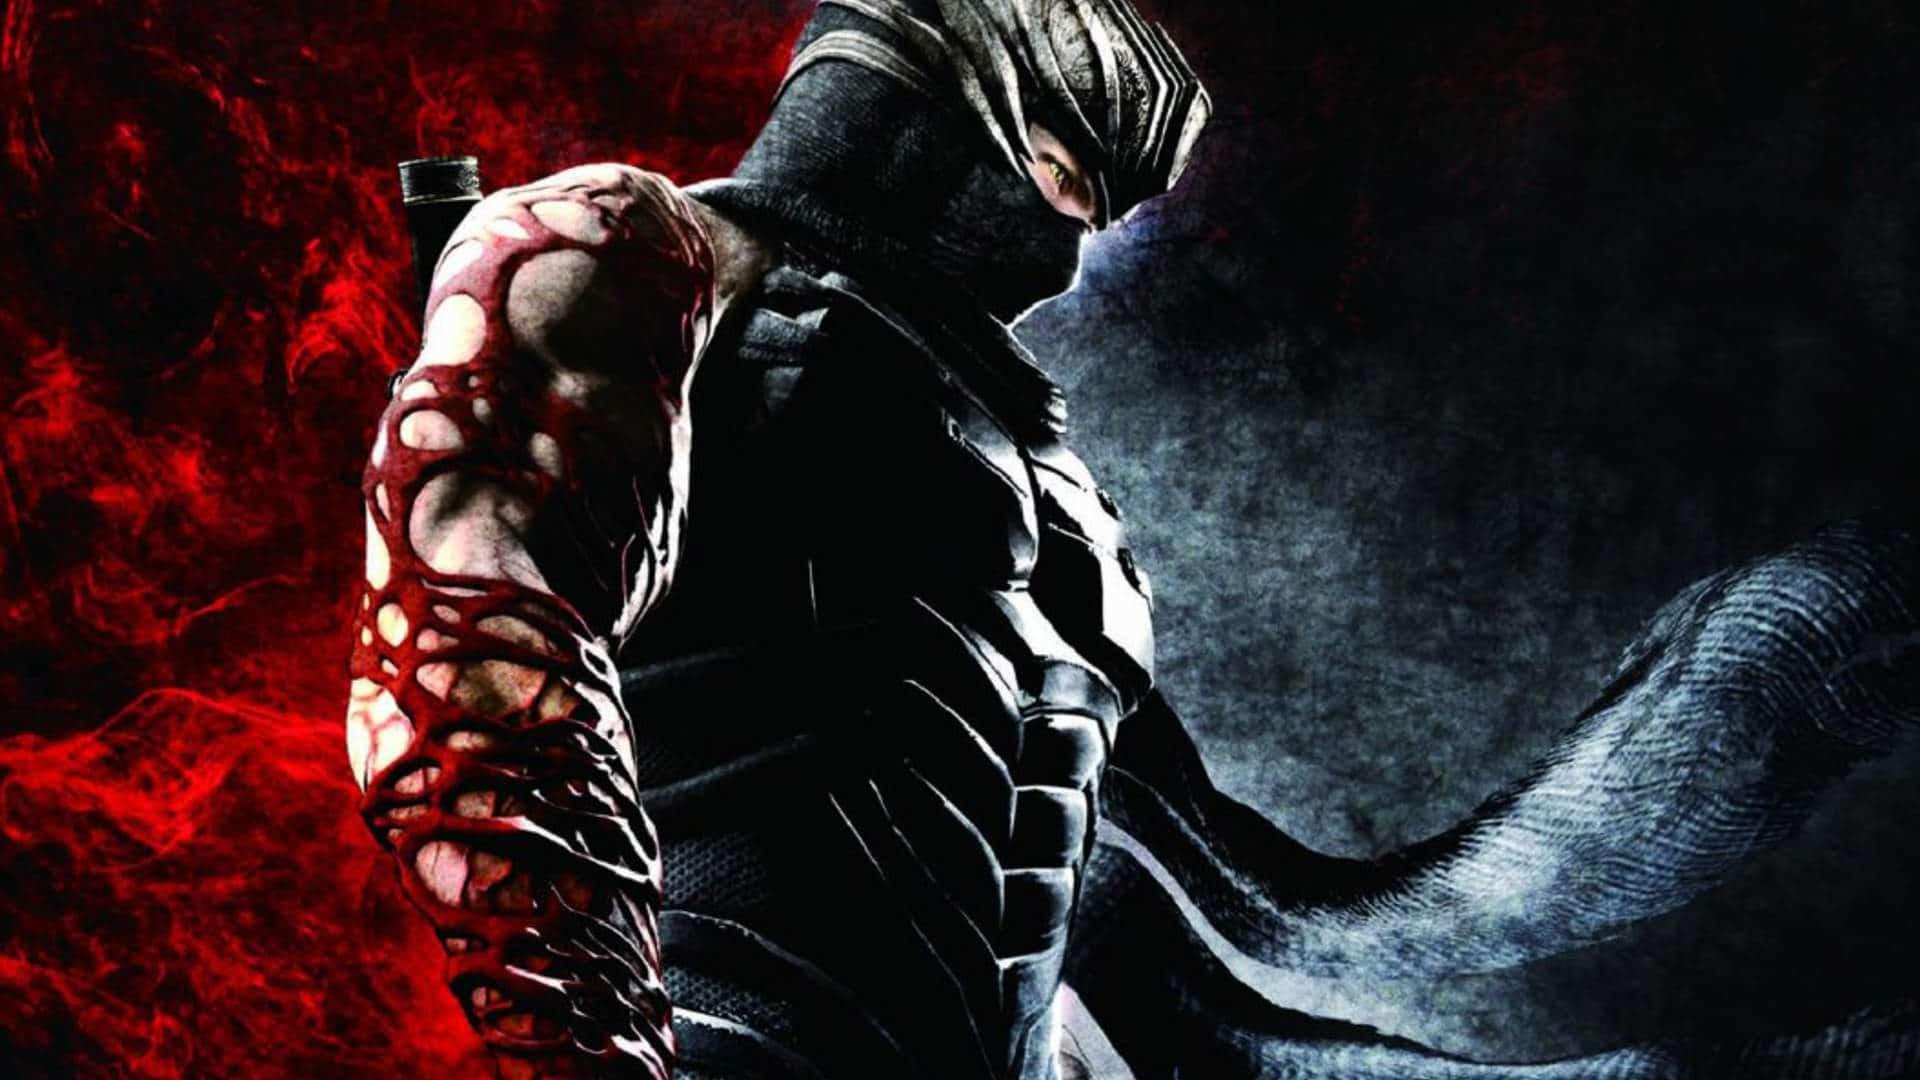 Le créateur de Dead or Alive et Ninja Gaiden fonde Itagaki Games